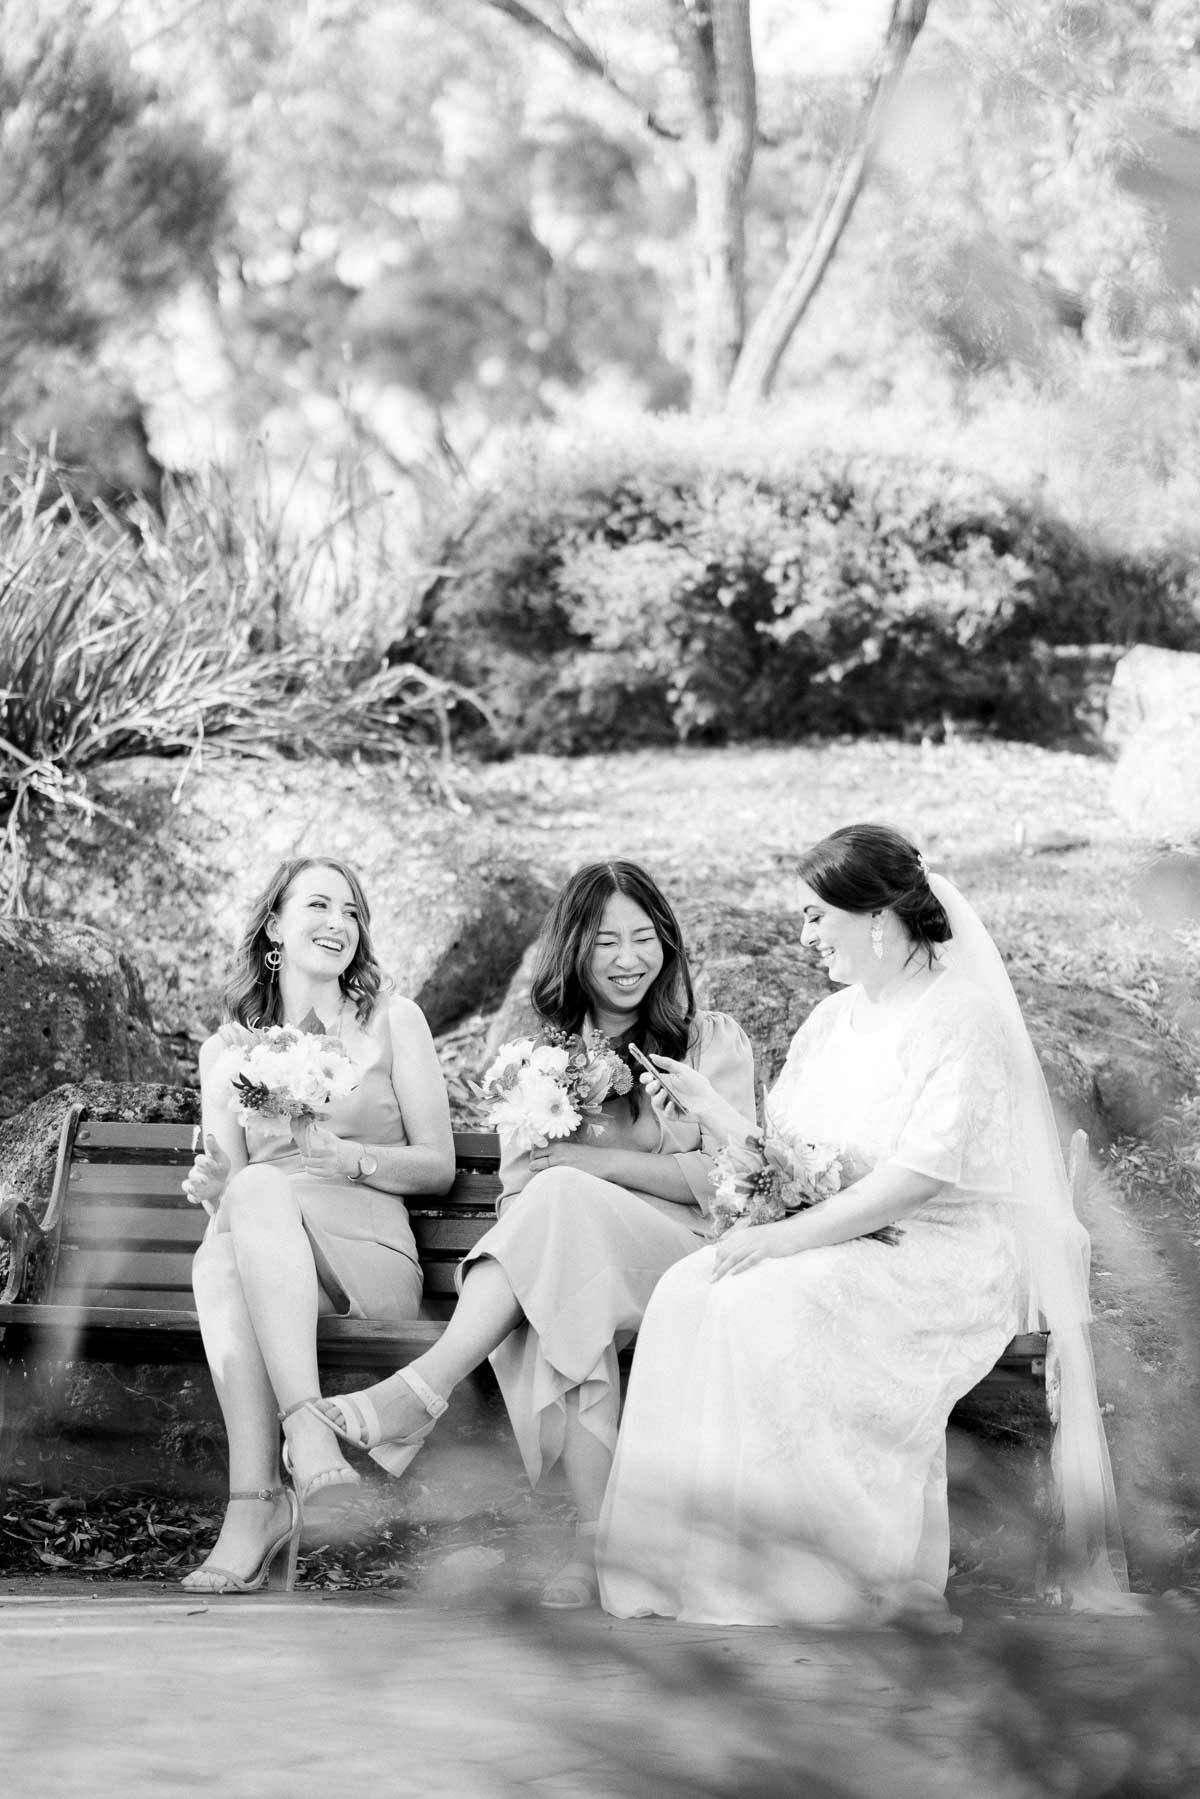 little-henri-cafe-wedding-thornbury-heart+soul-weddings-jane-aaron-05499.jpg